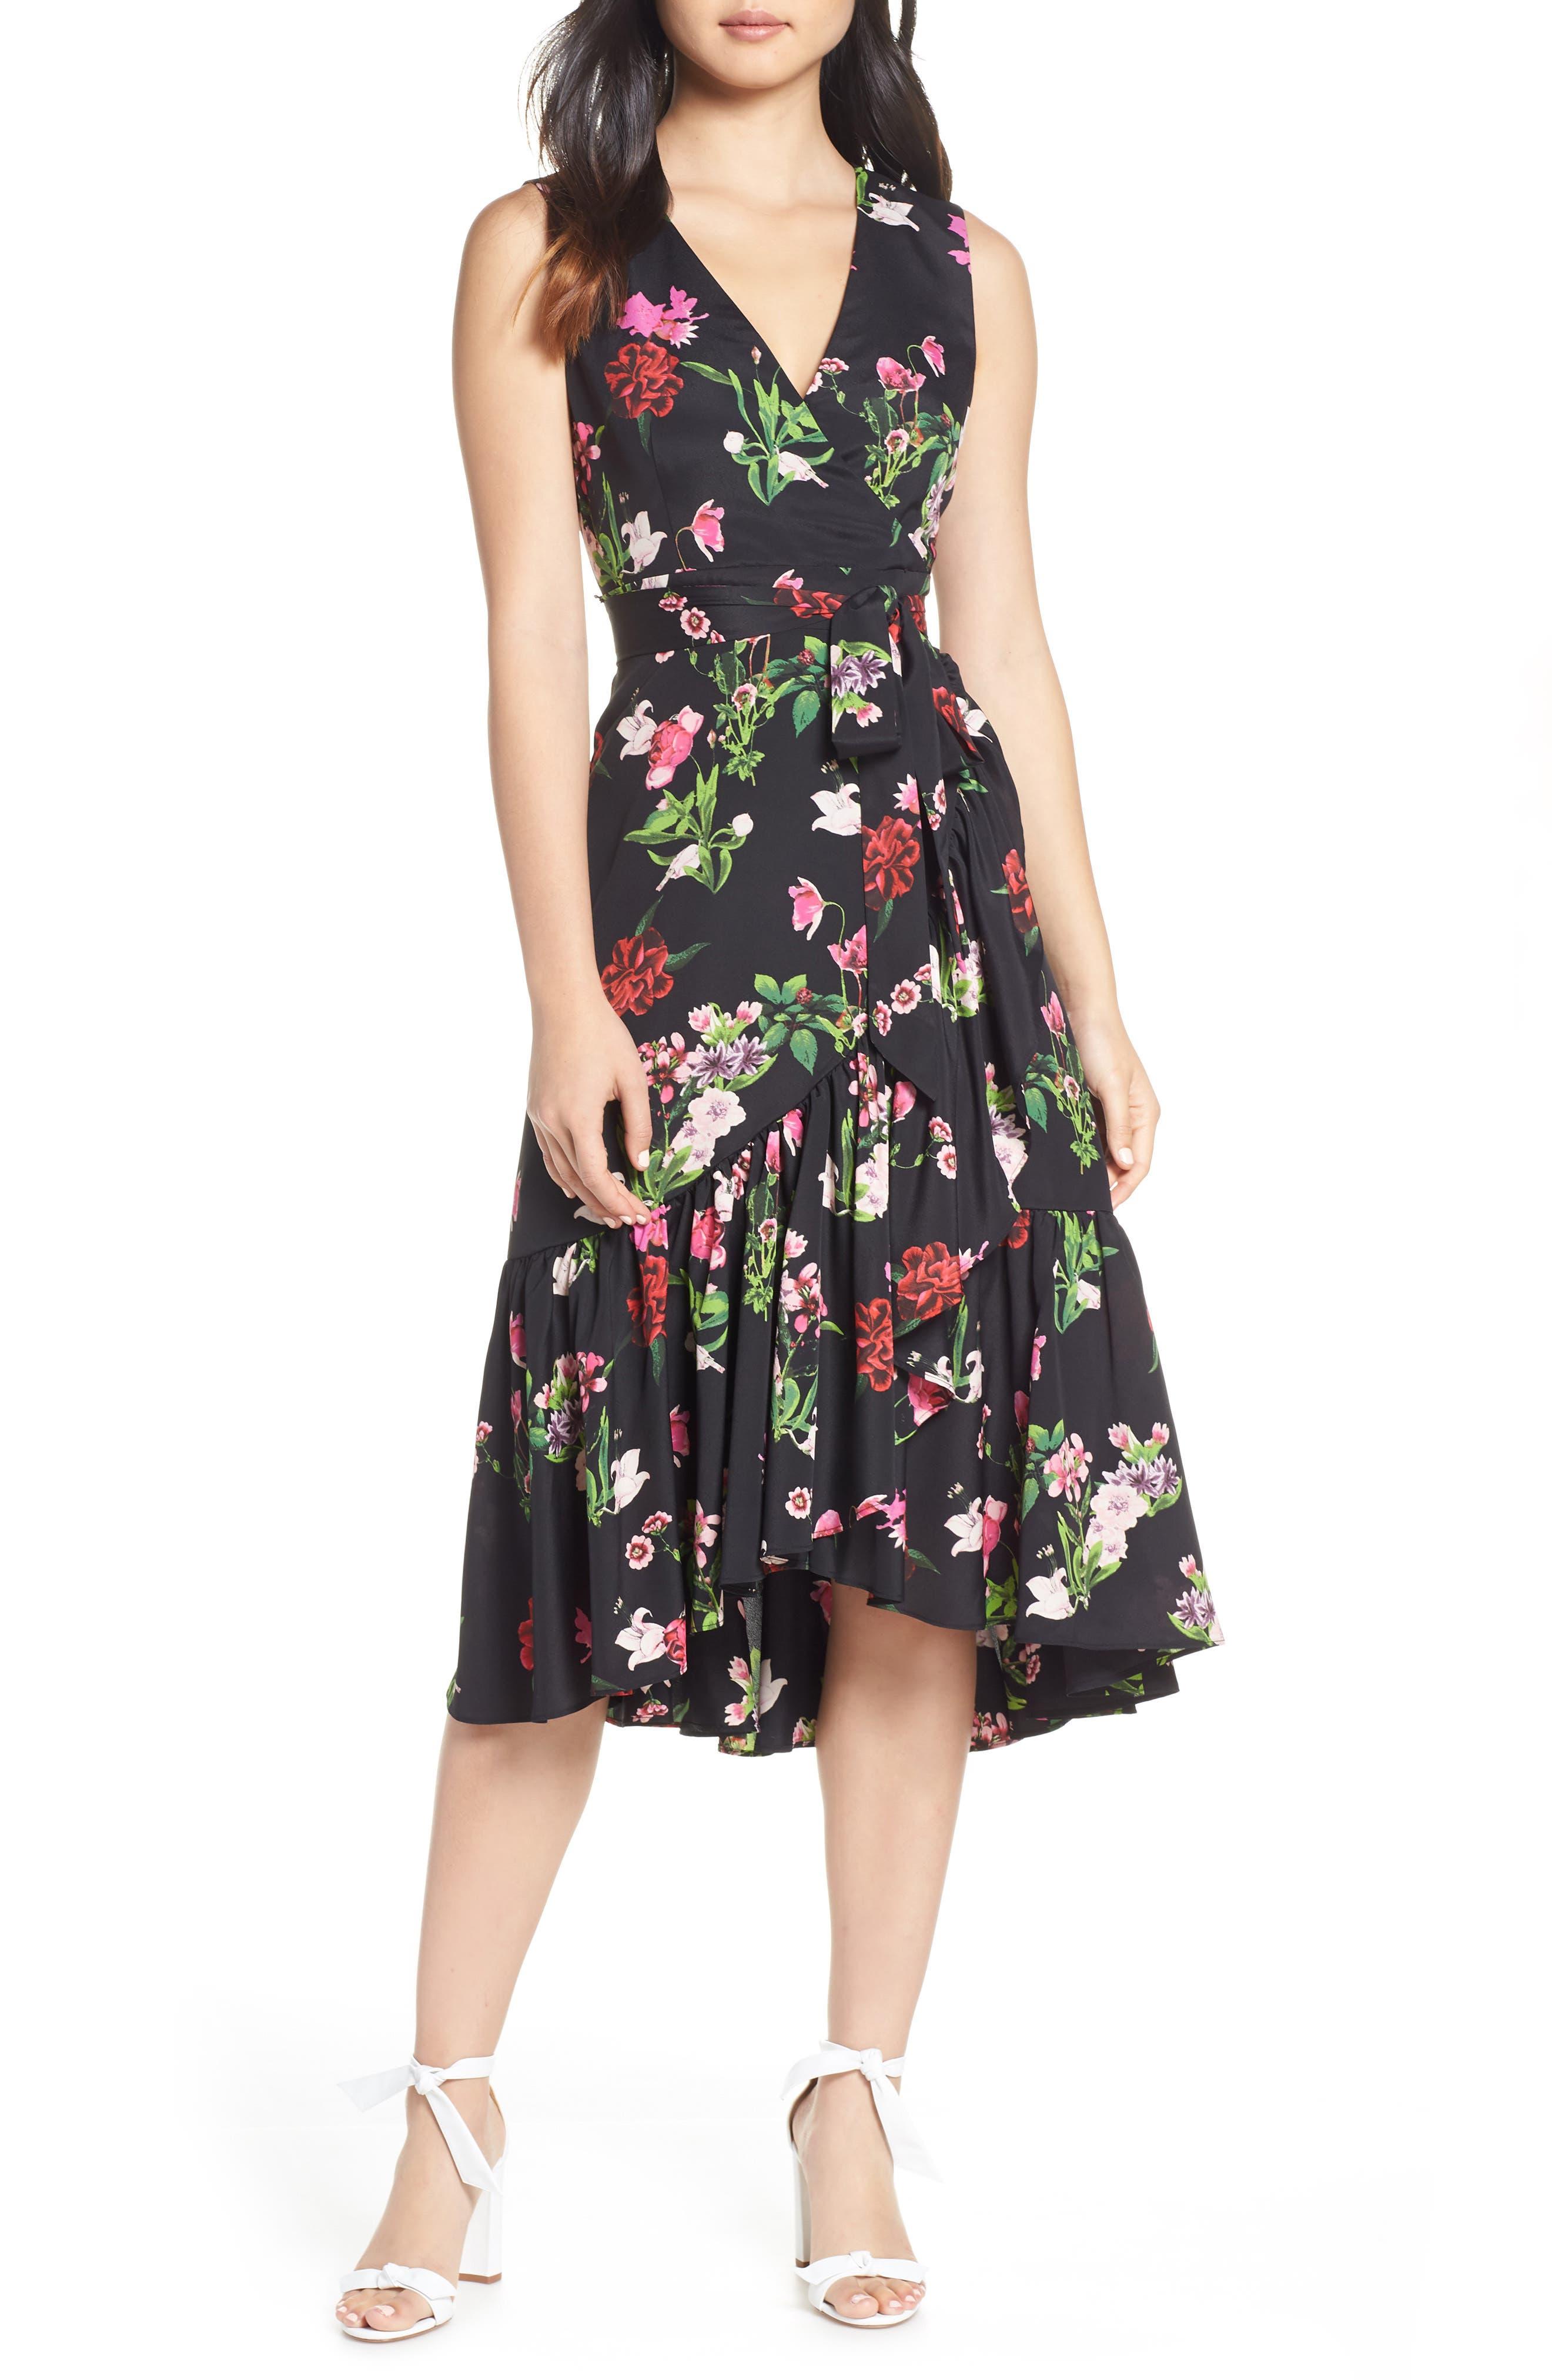 ELIZA J, Ruffle Hem Faux Wrap Dress, Main thumbnail 1, color, BLACK